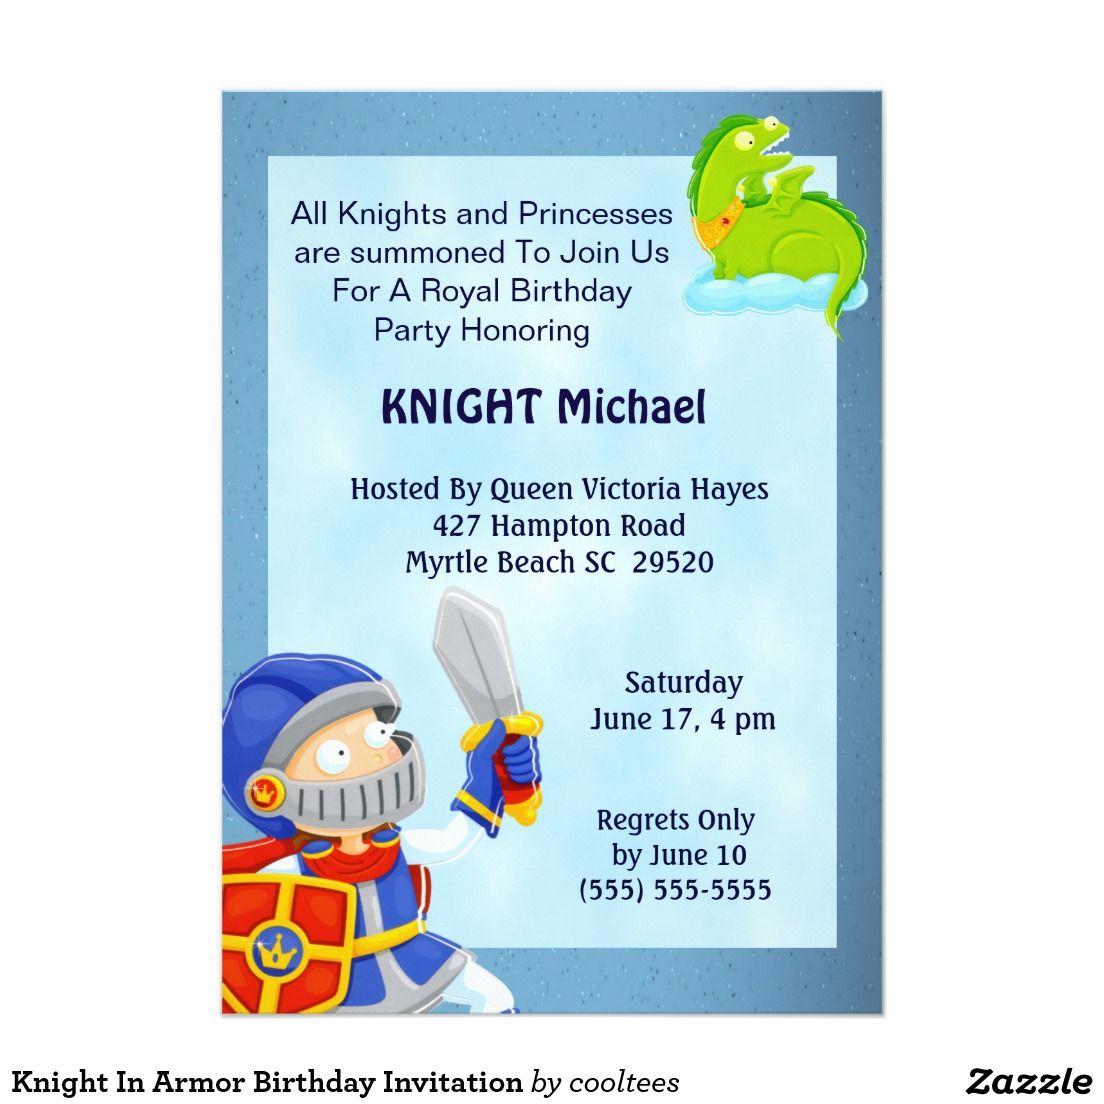 Knight In Armor Birthday Invitation | Knights & Dragons Birthday ...